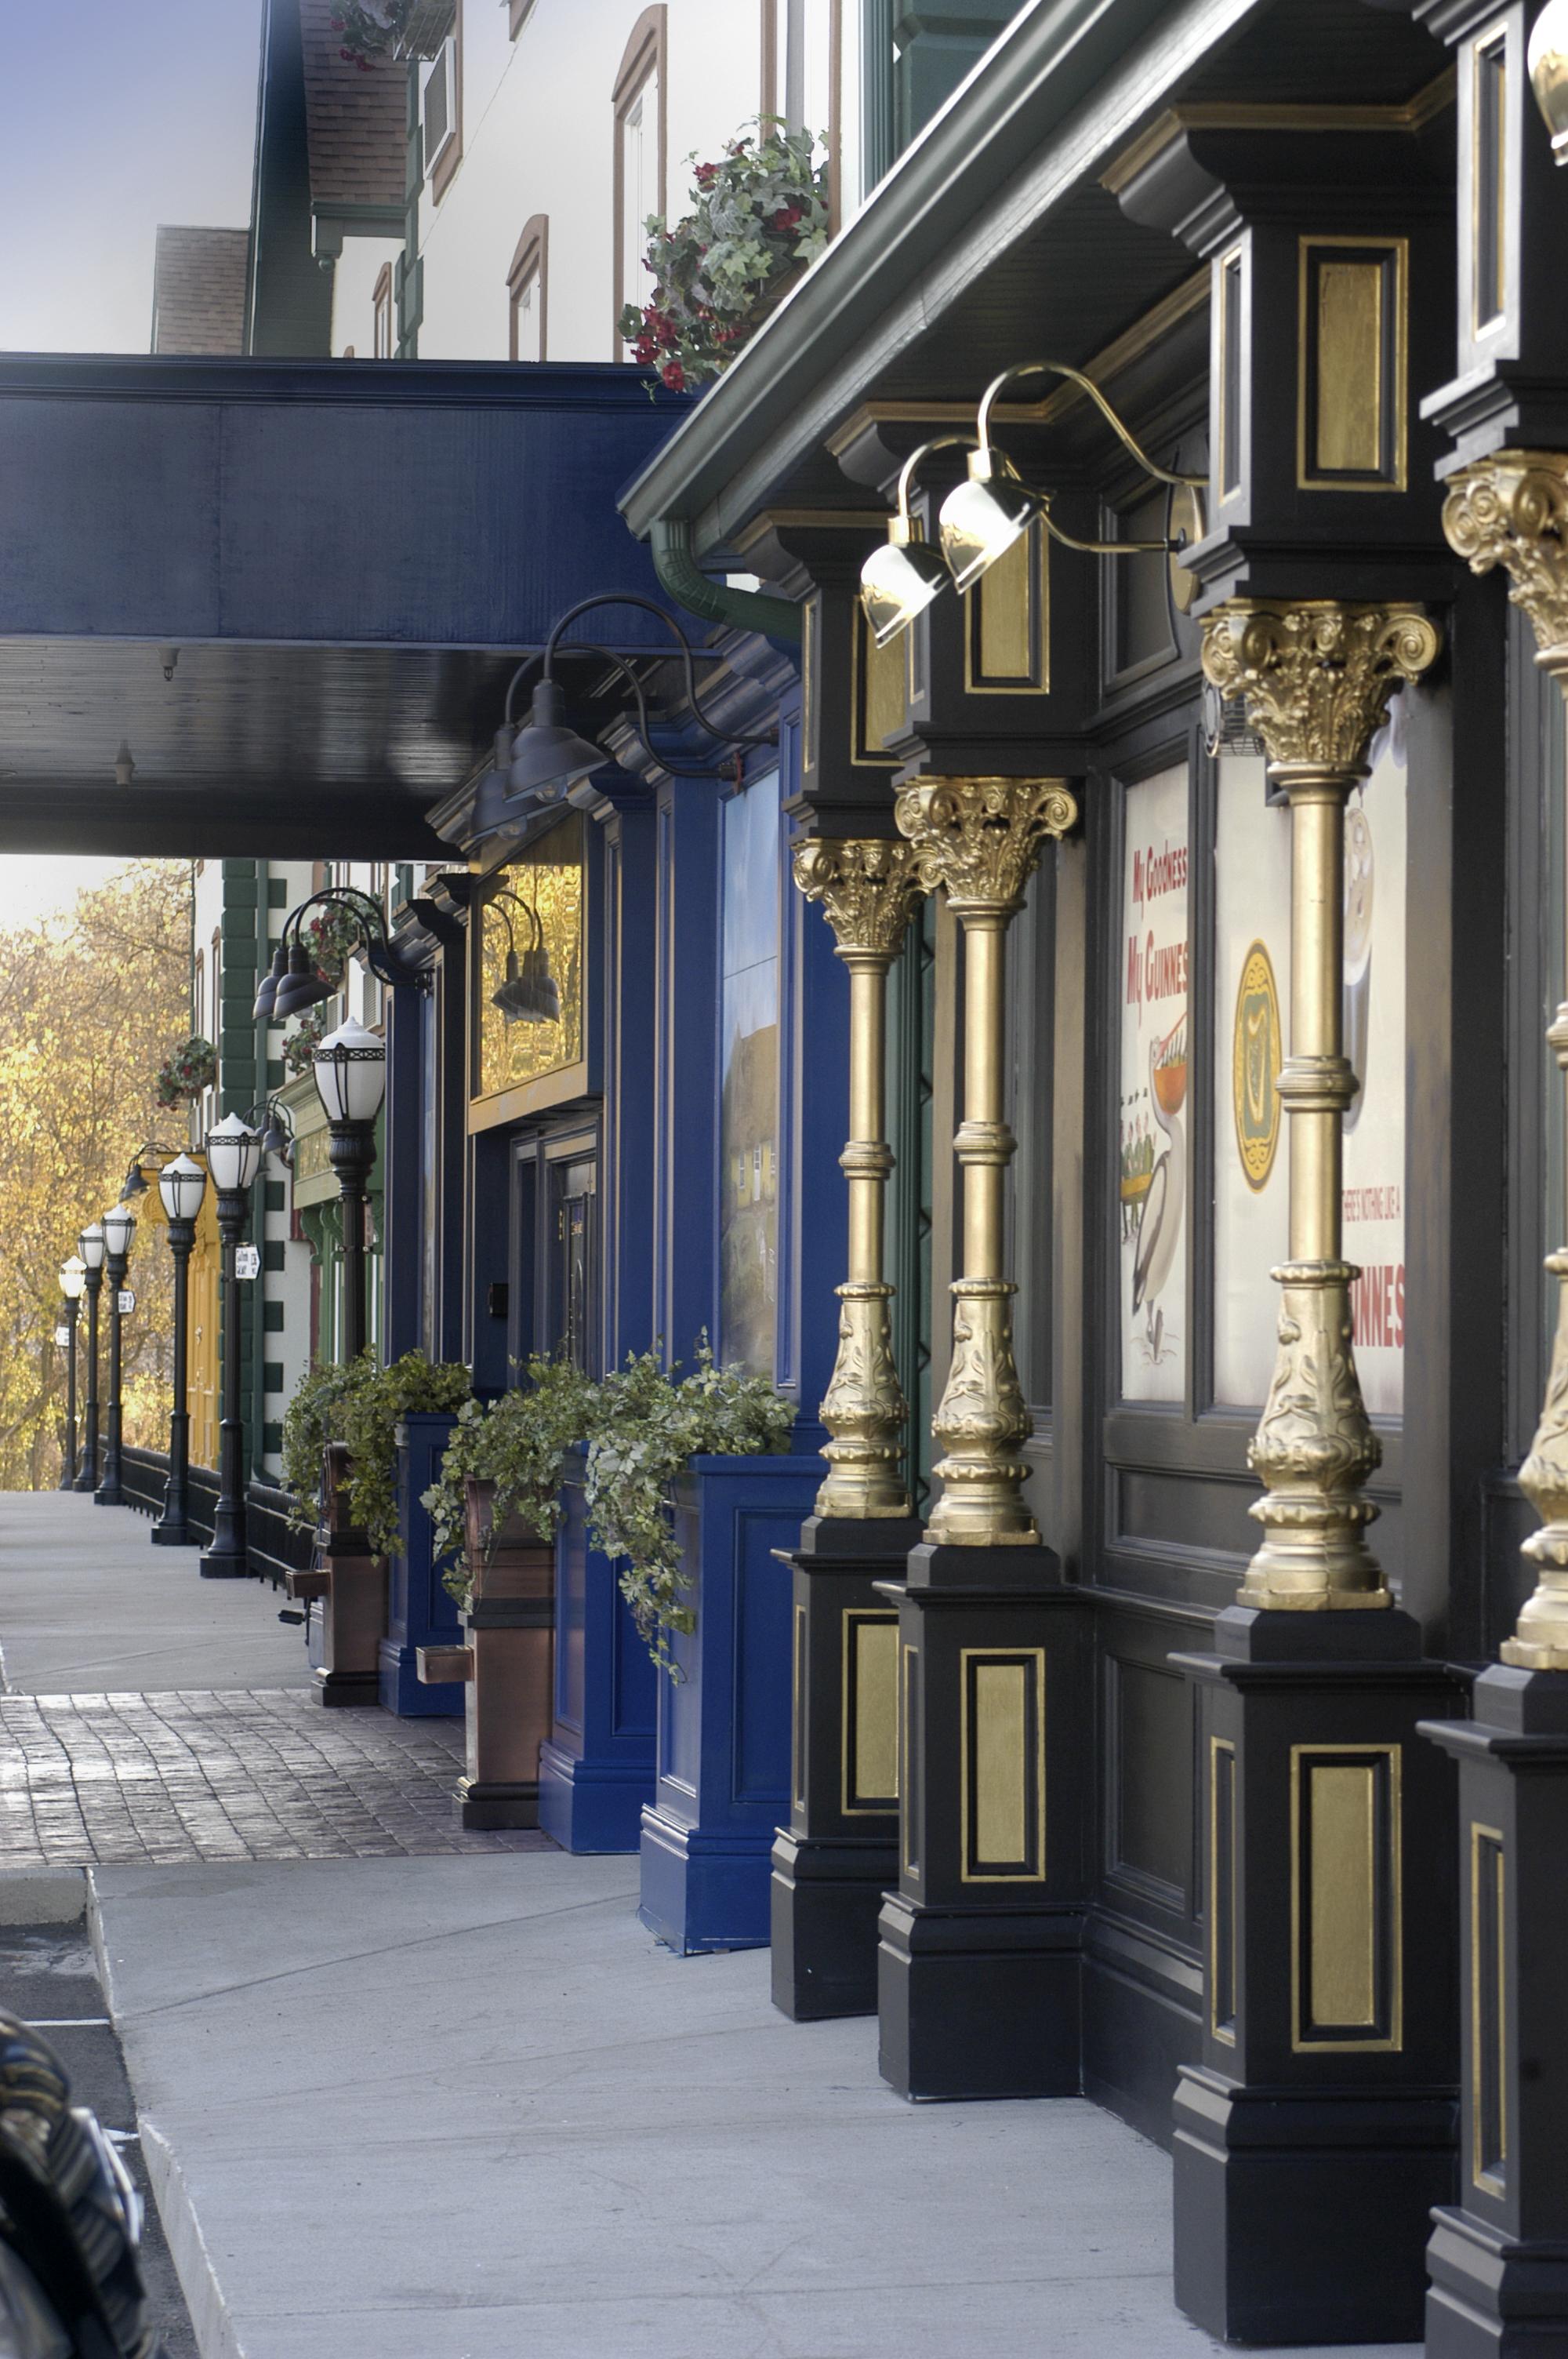 Prime The Irish Cottage Boutique Hotel Enjoy Illinois Download Free Architecture Designs Sospemadebymaigaardcom